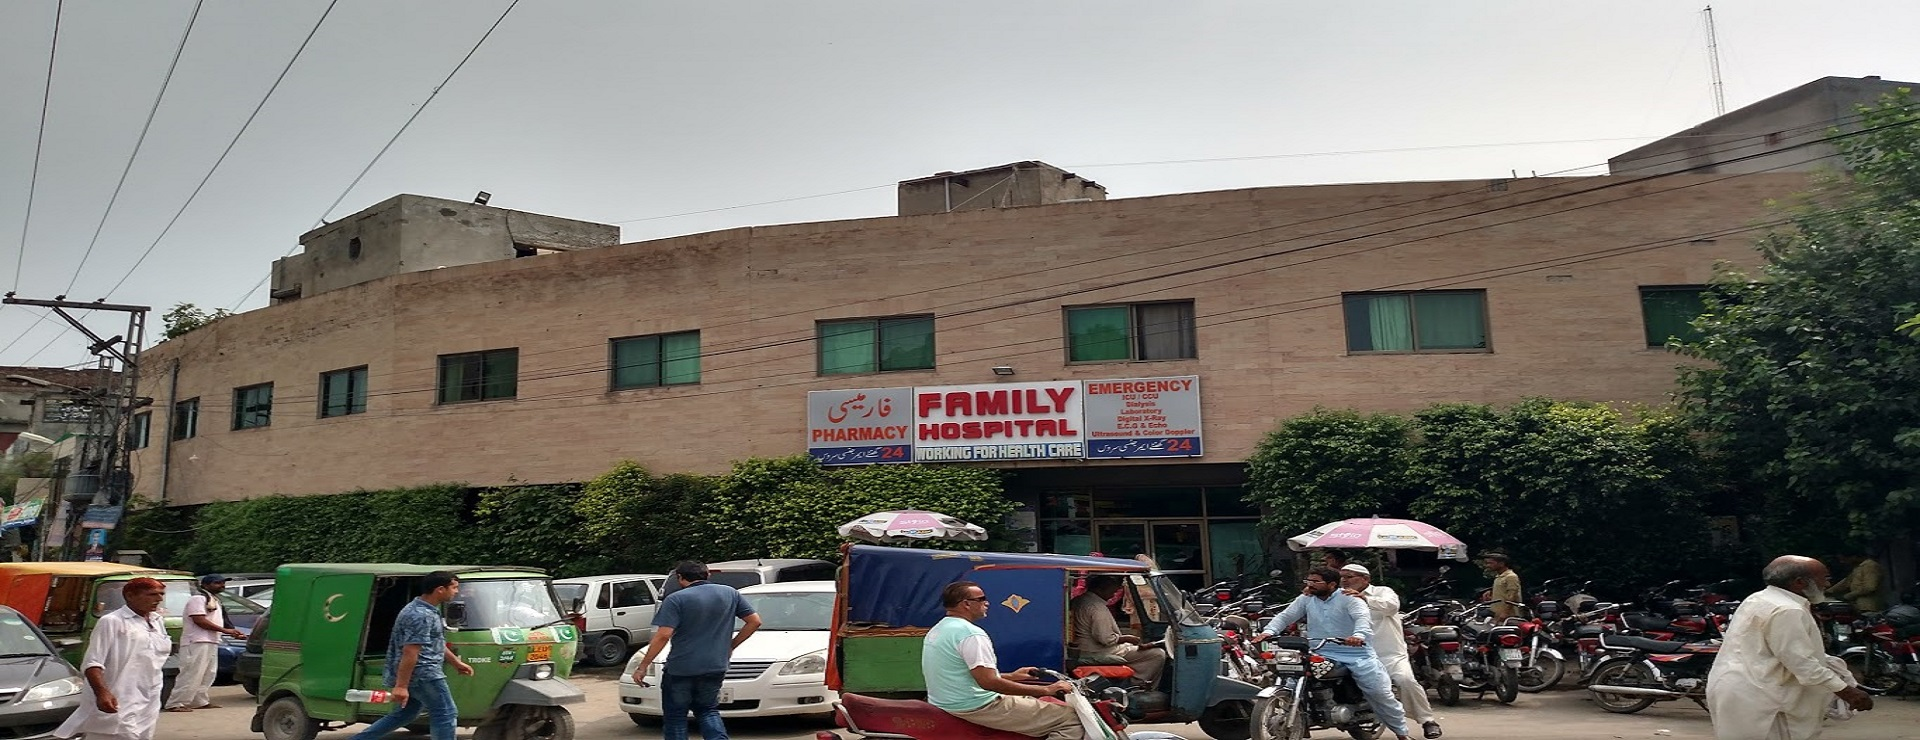 Family hospital front